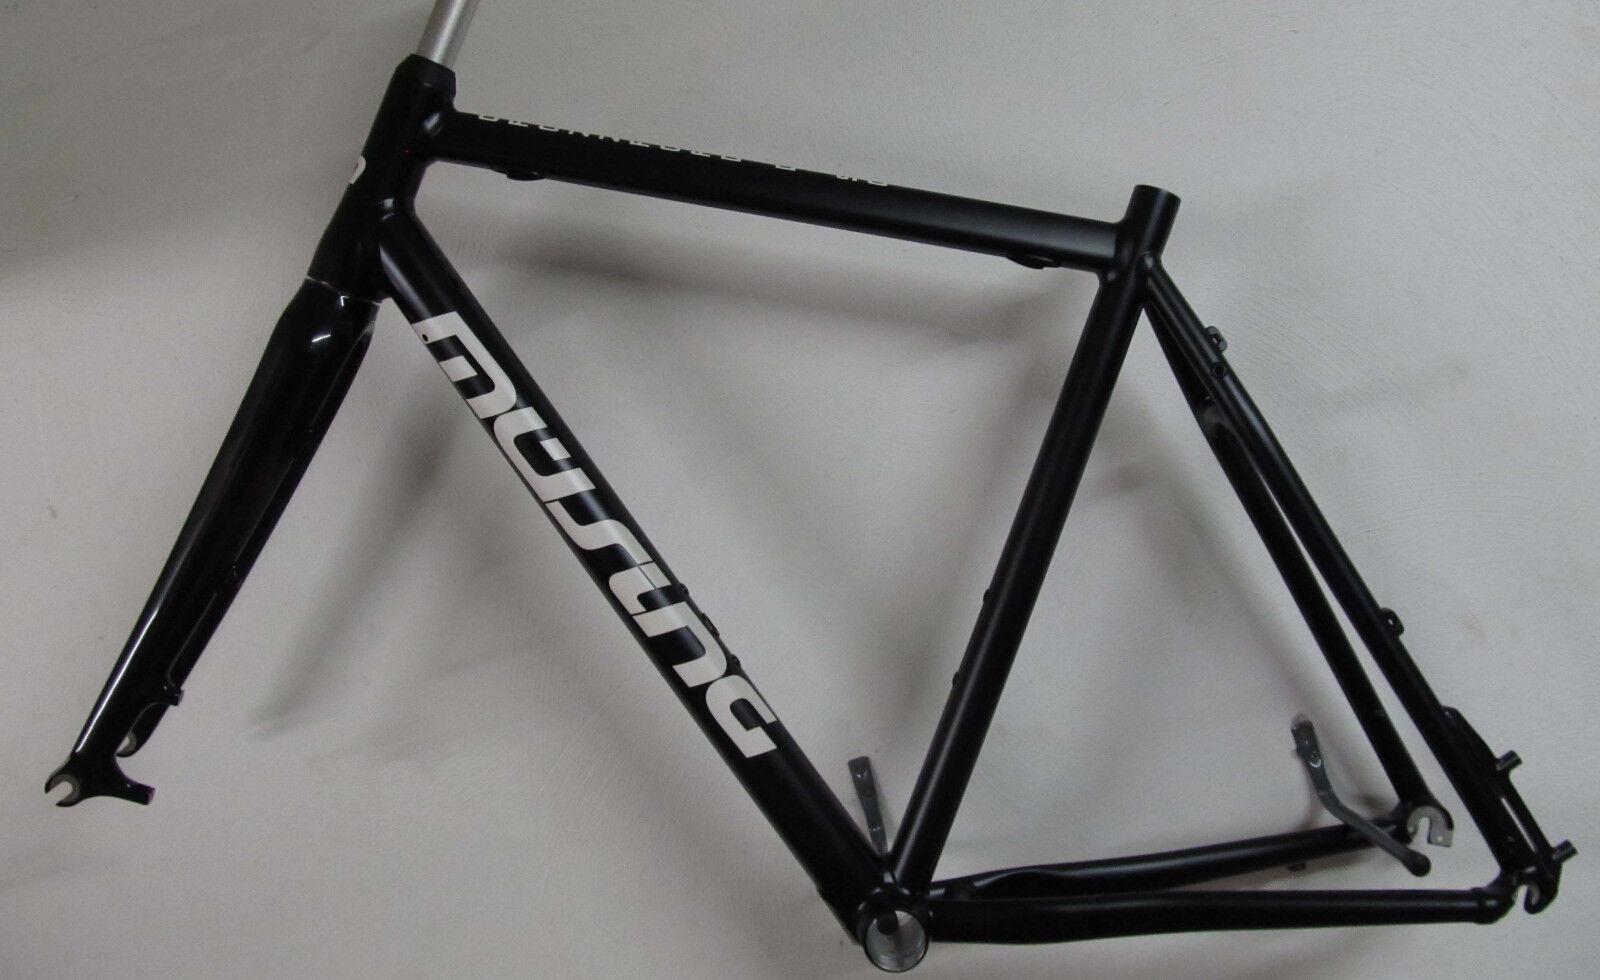 Müsing Crozzroad Disc Cyclo Cross Cyclocross Rahmenkit 54cm black matt 2018